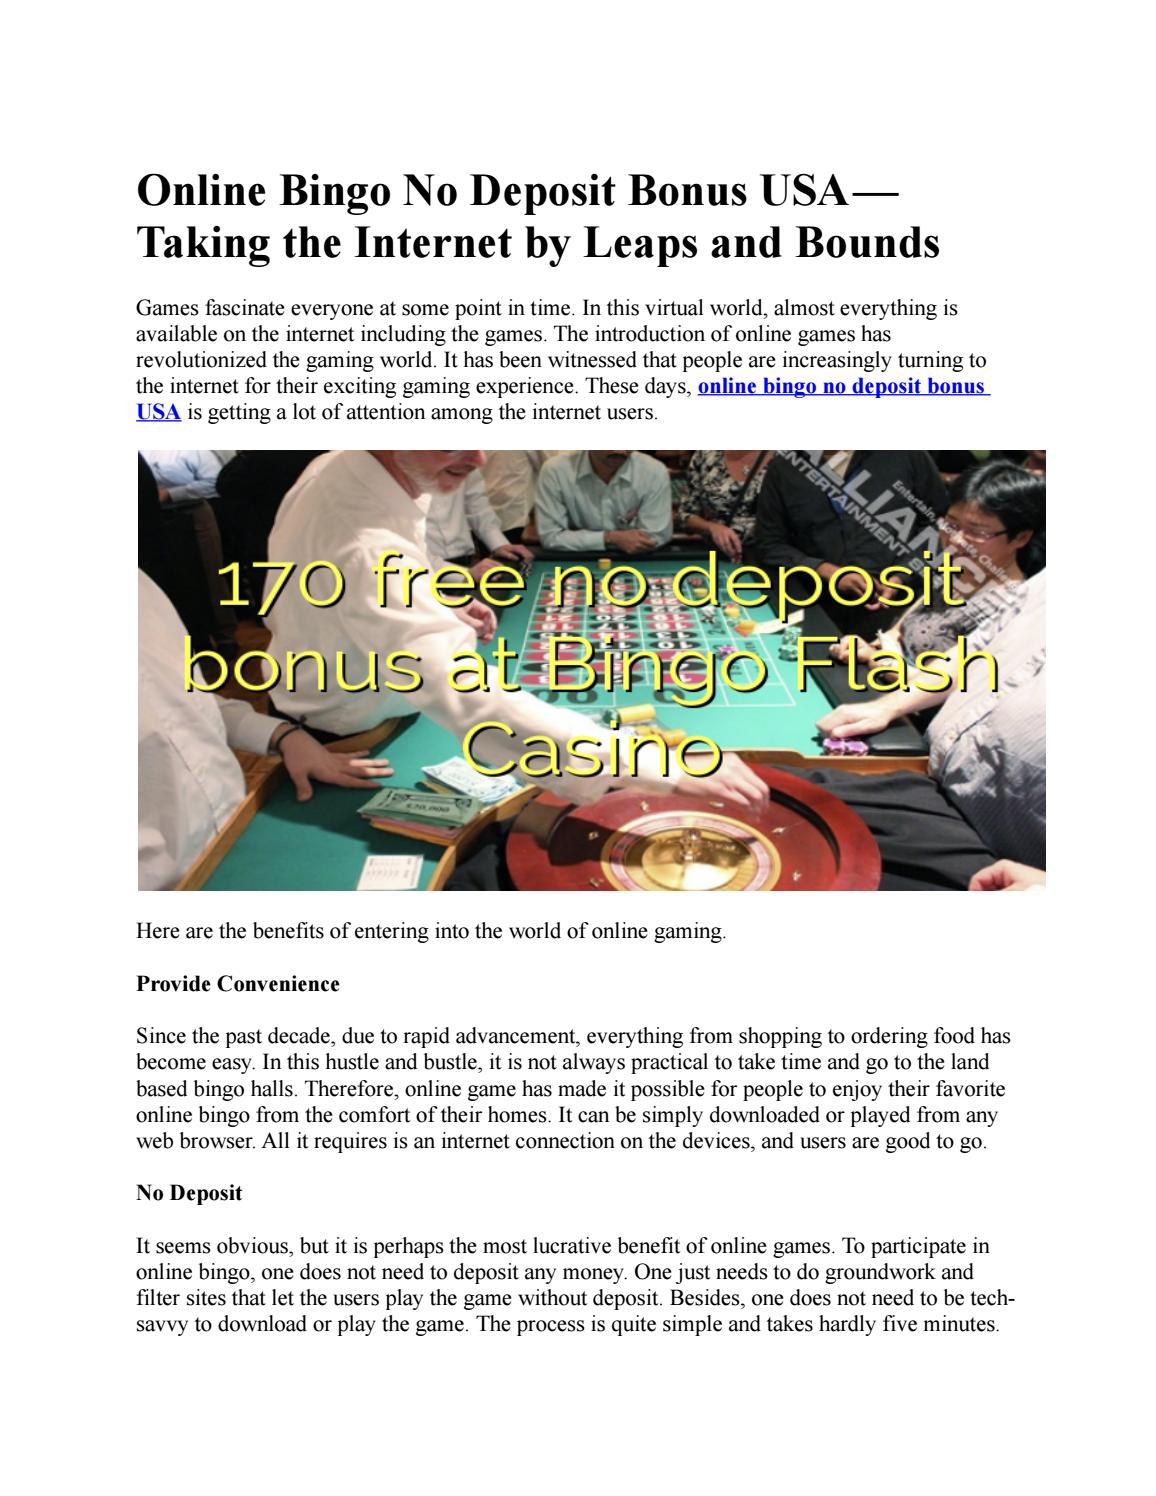 Online Casino Real Money No Deposit Bonus Usa By Onthegocasinos